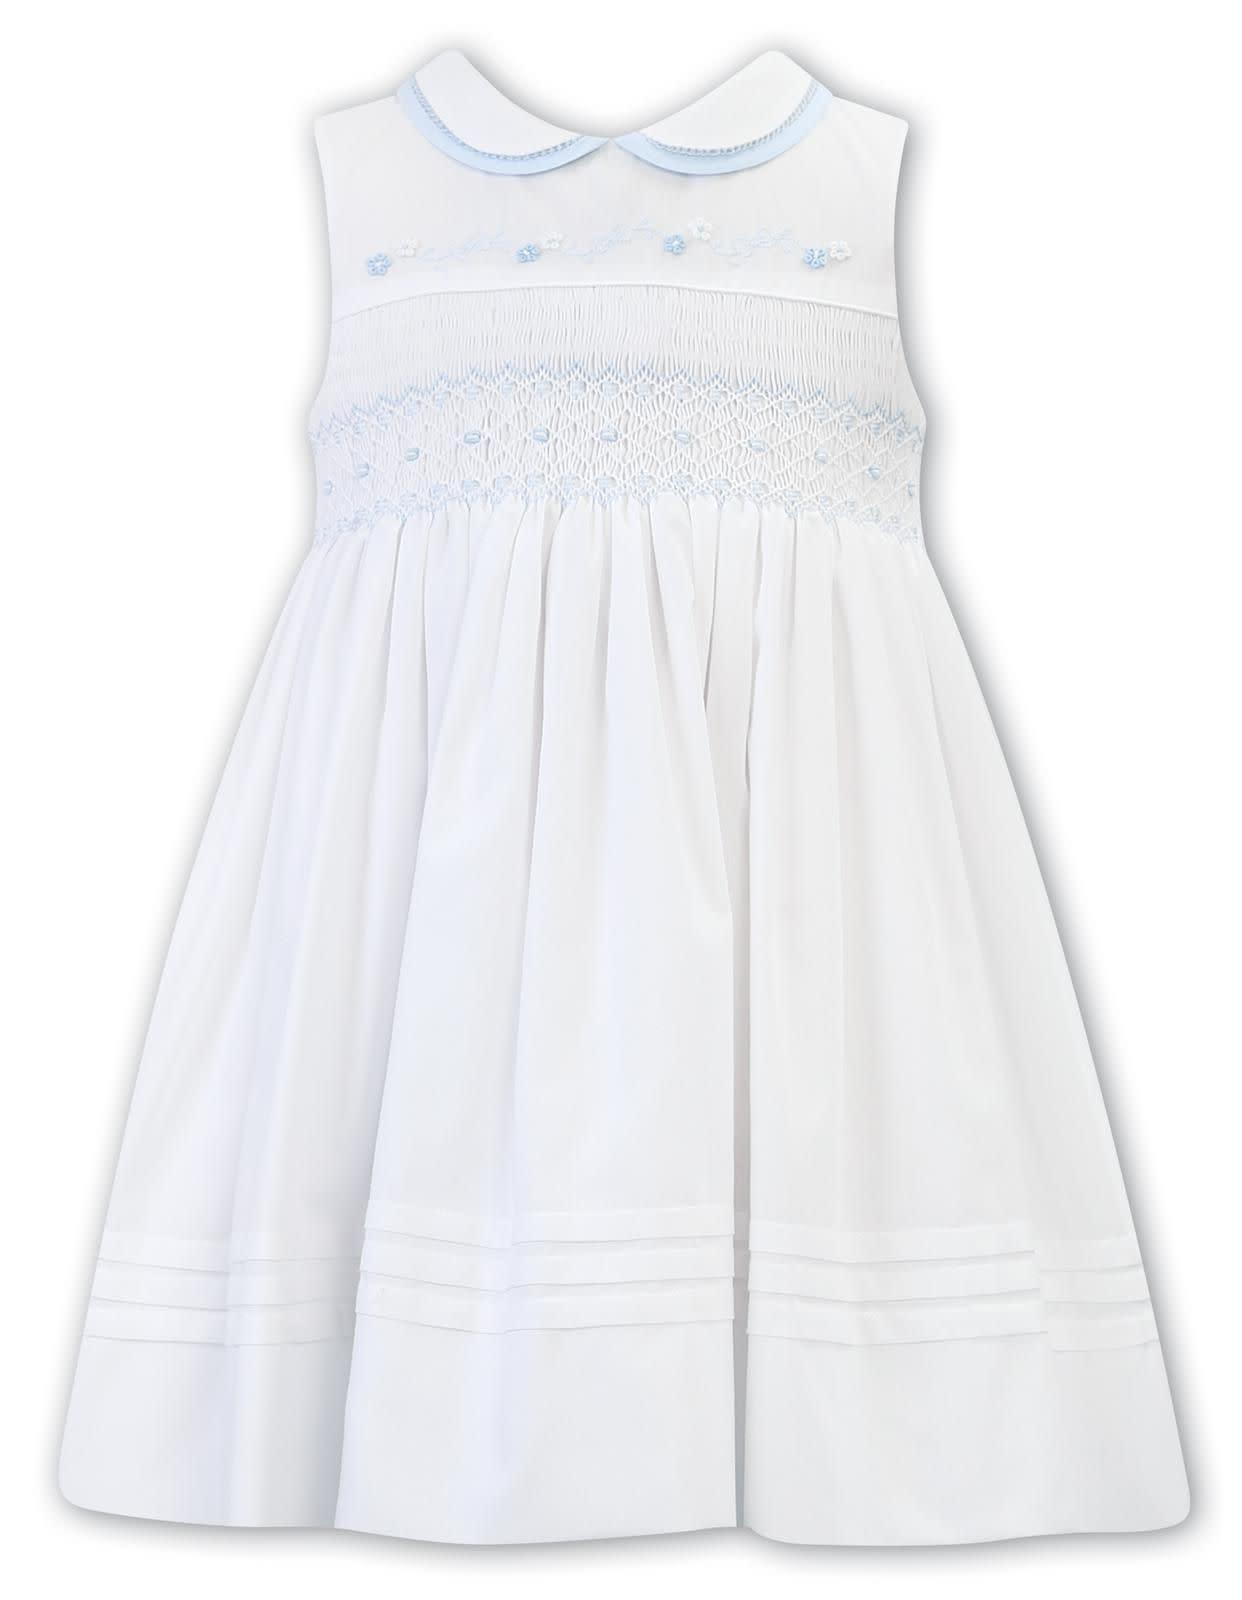 Sarah Louise Sarah Louise White/Blue Embroidery Dress 012266 6YEARS